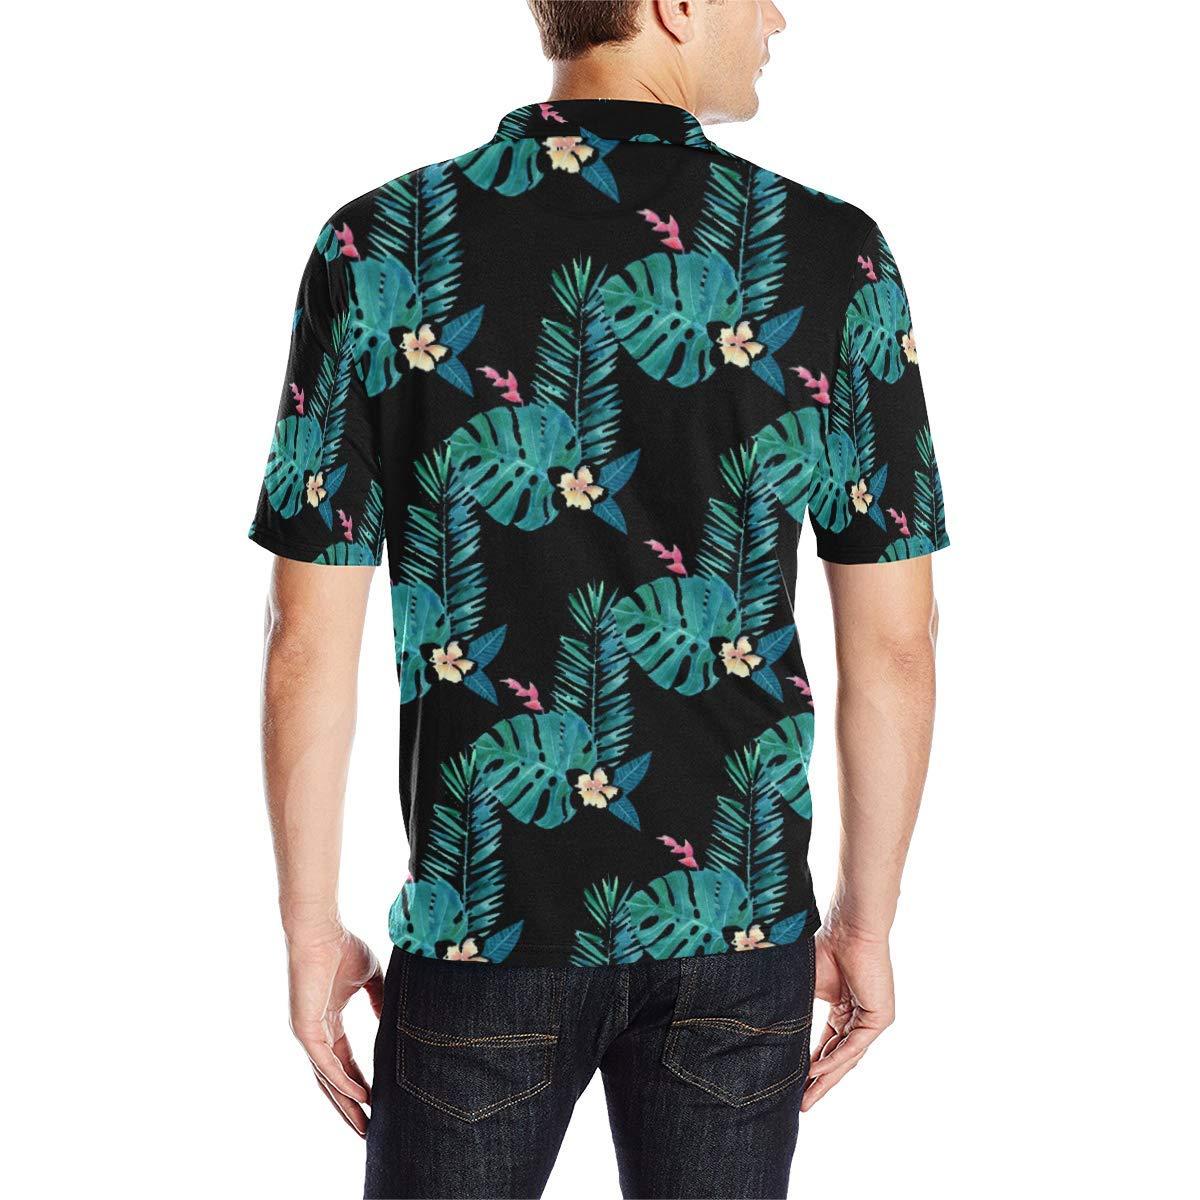 BrowneOLp Short Sleeve Blue Midnight Tropical Mens All Over Print Polo Shirt